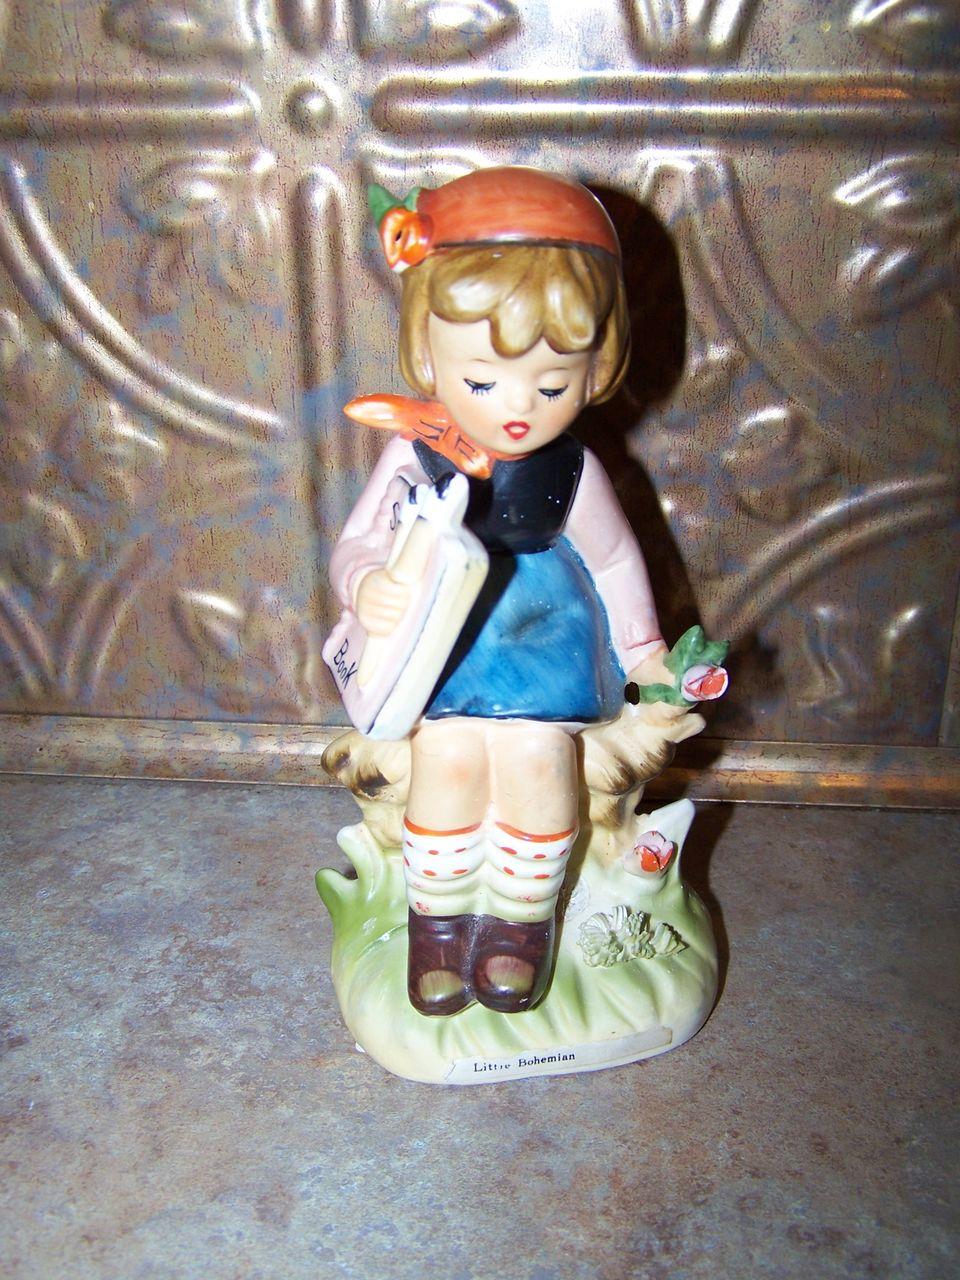 Vintage Ceramic Hummel Style Figurine By Erick Stauffer  Little Bohemian